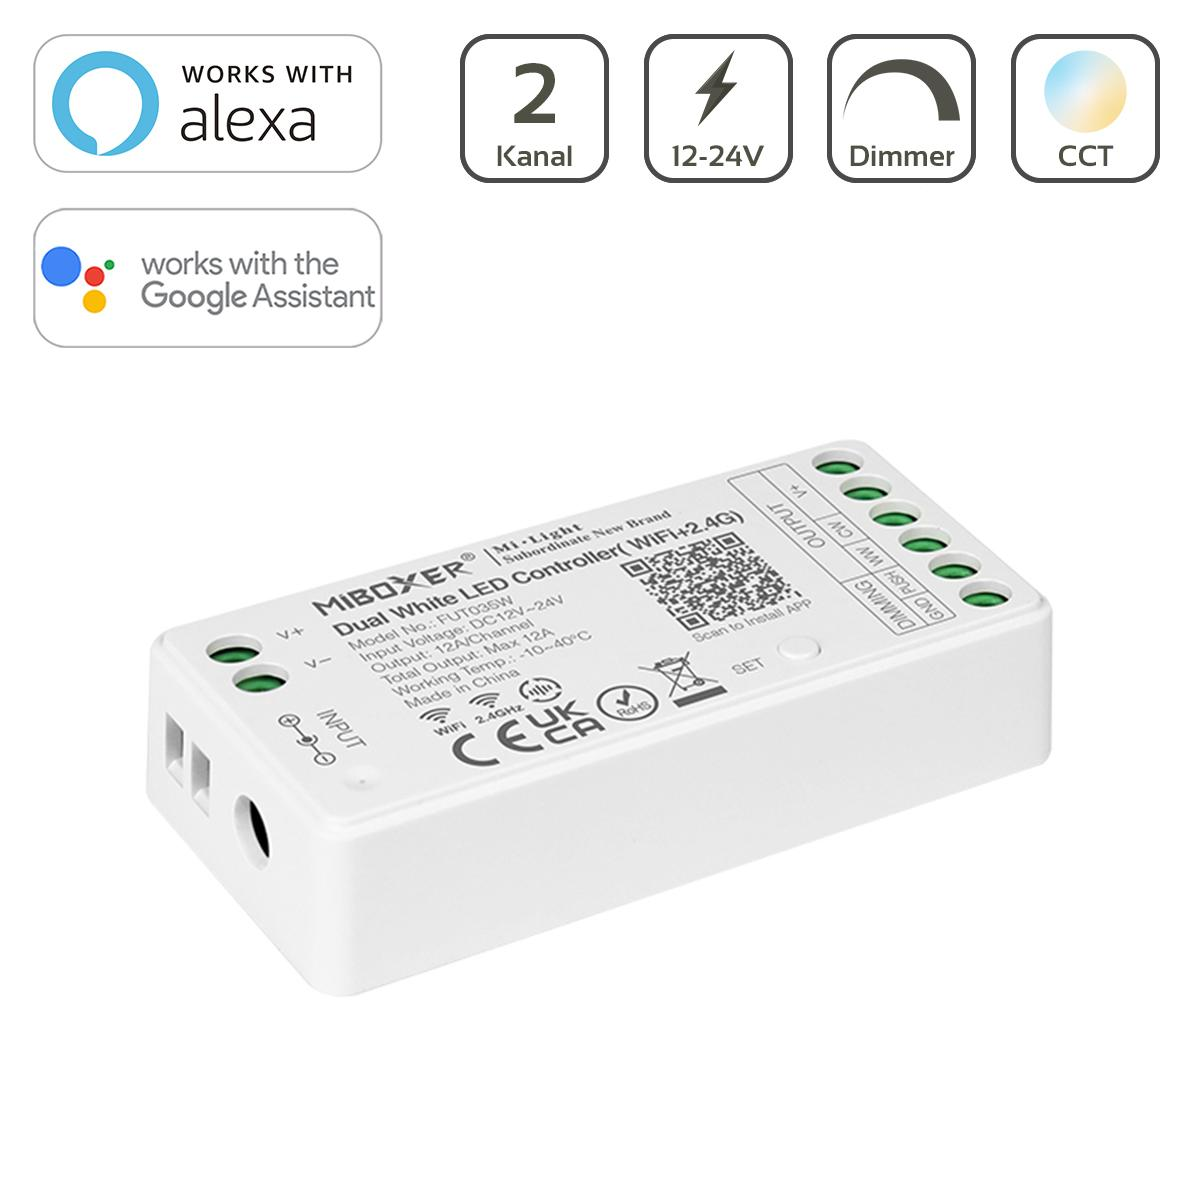 MiBoxer CCT WIFI LED Controller 2 Kanal 12/24V  WiFi Tuya Alexa Google Steuerung FUT035W